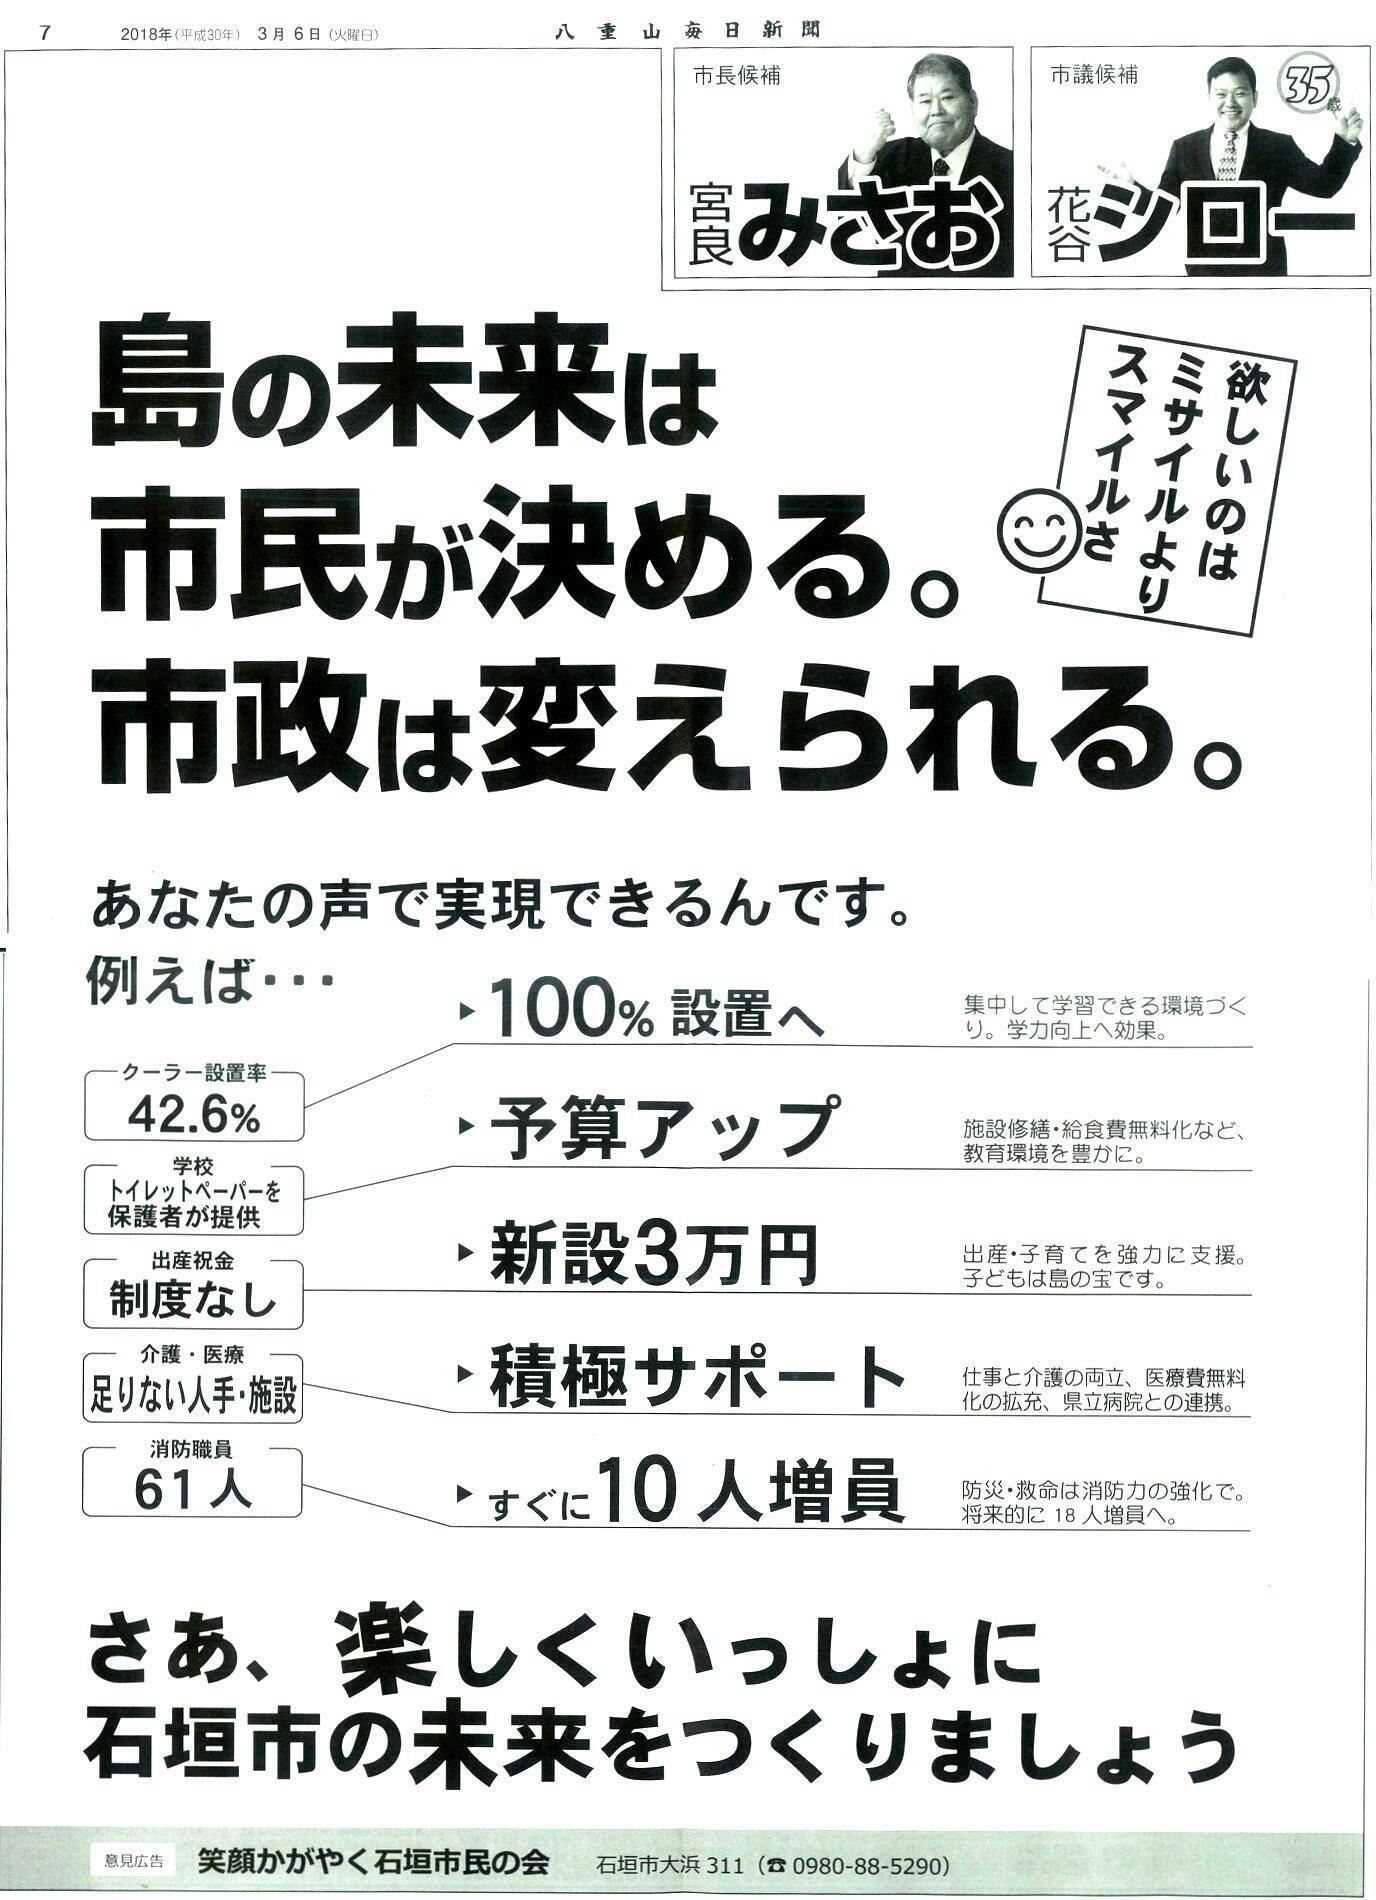 yae2018 0306koukoku